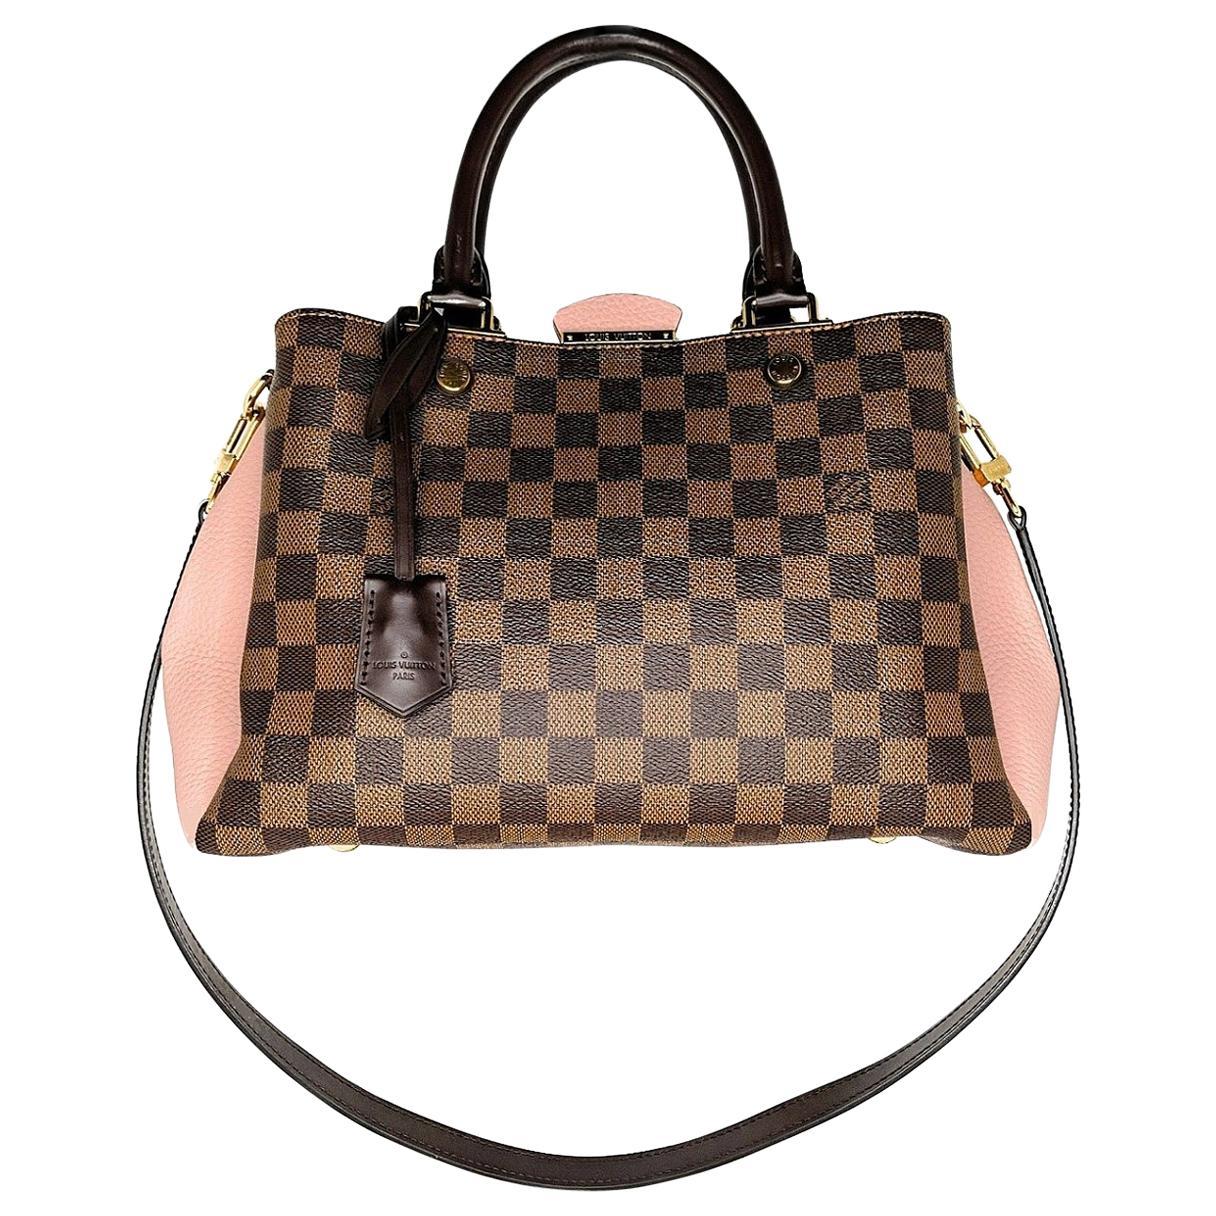 Louis Vuitton Damier Ebene Brittany Handbag Satchel